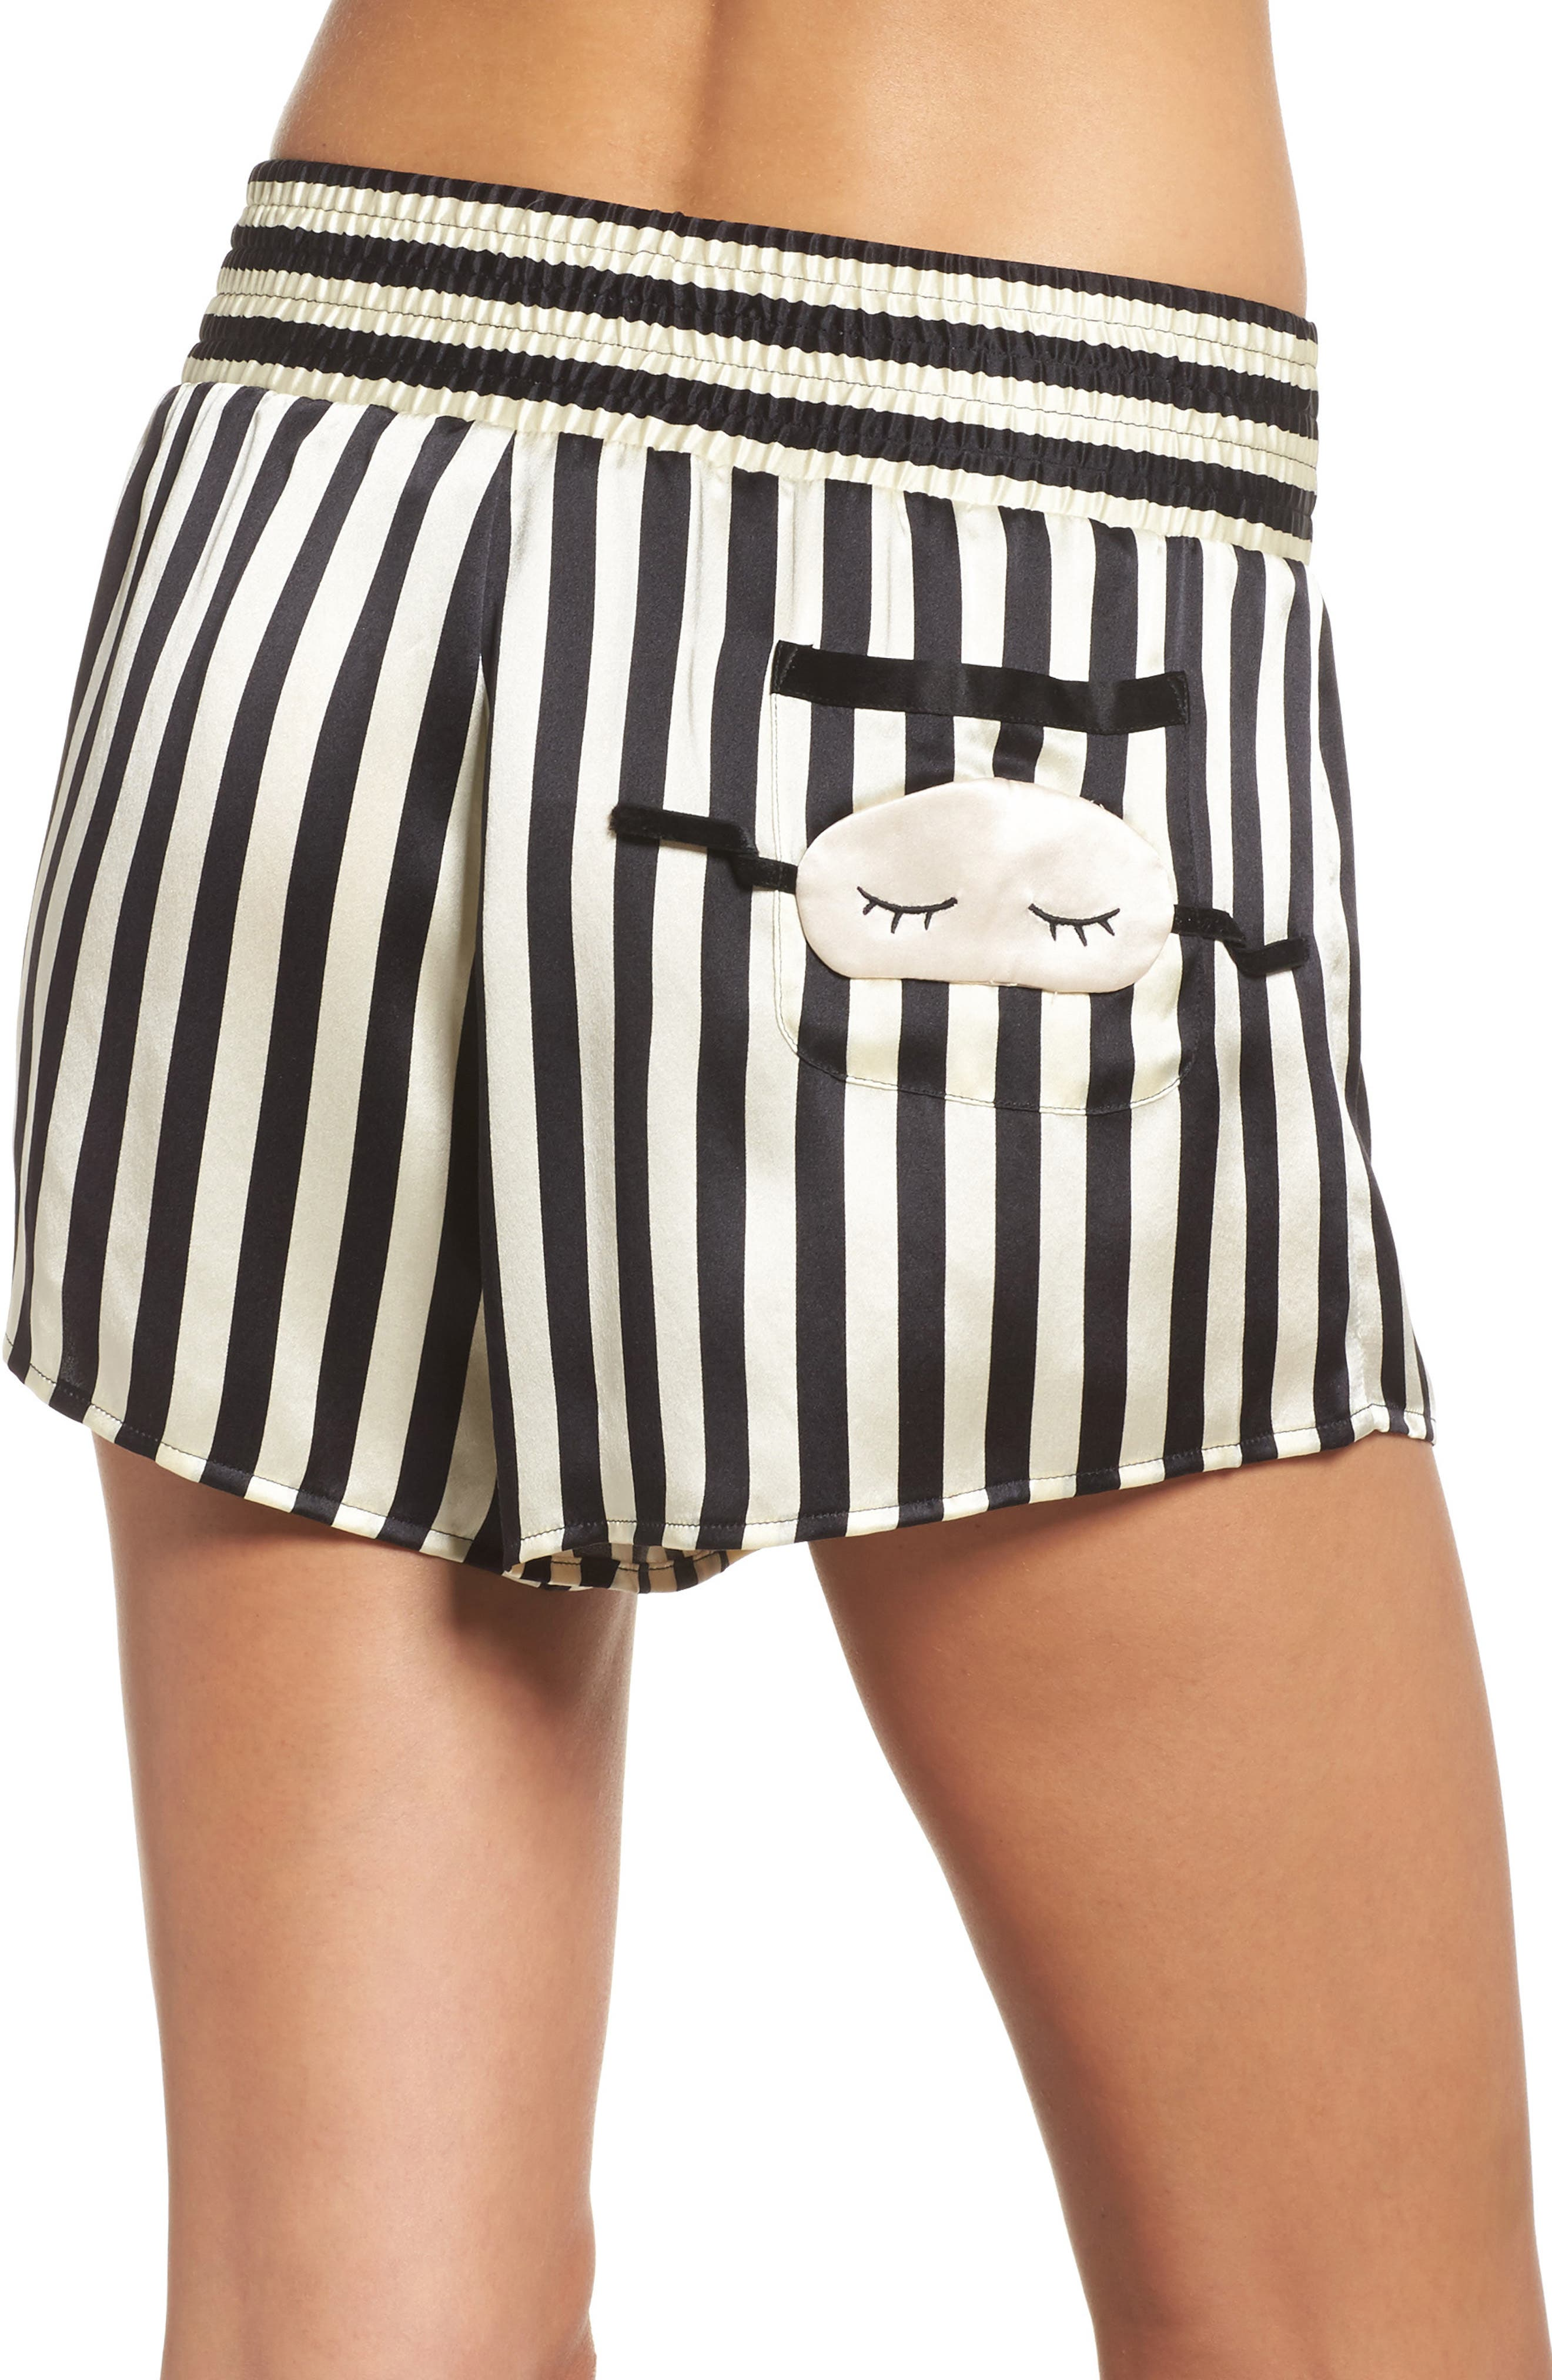 x Amanda Fatherazi Mini Mask Corey Stripe Silk Shorts,                             Alternate thumbnail 2, color,                             004